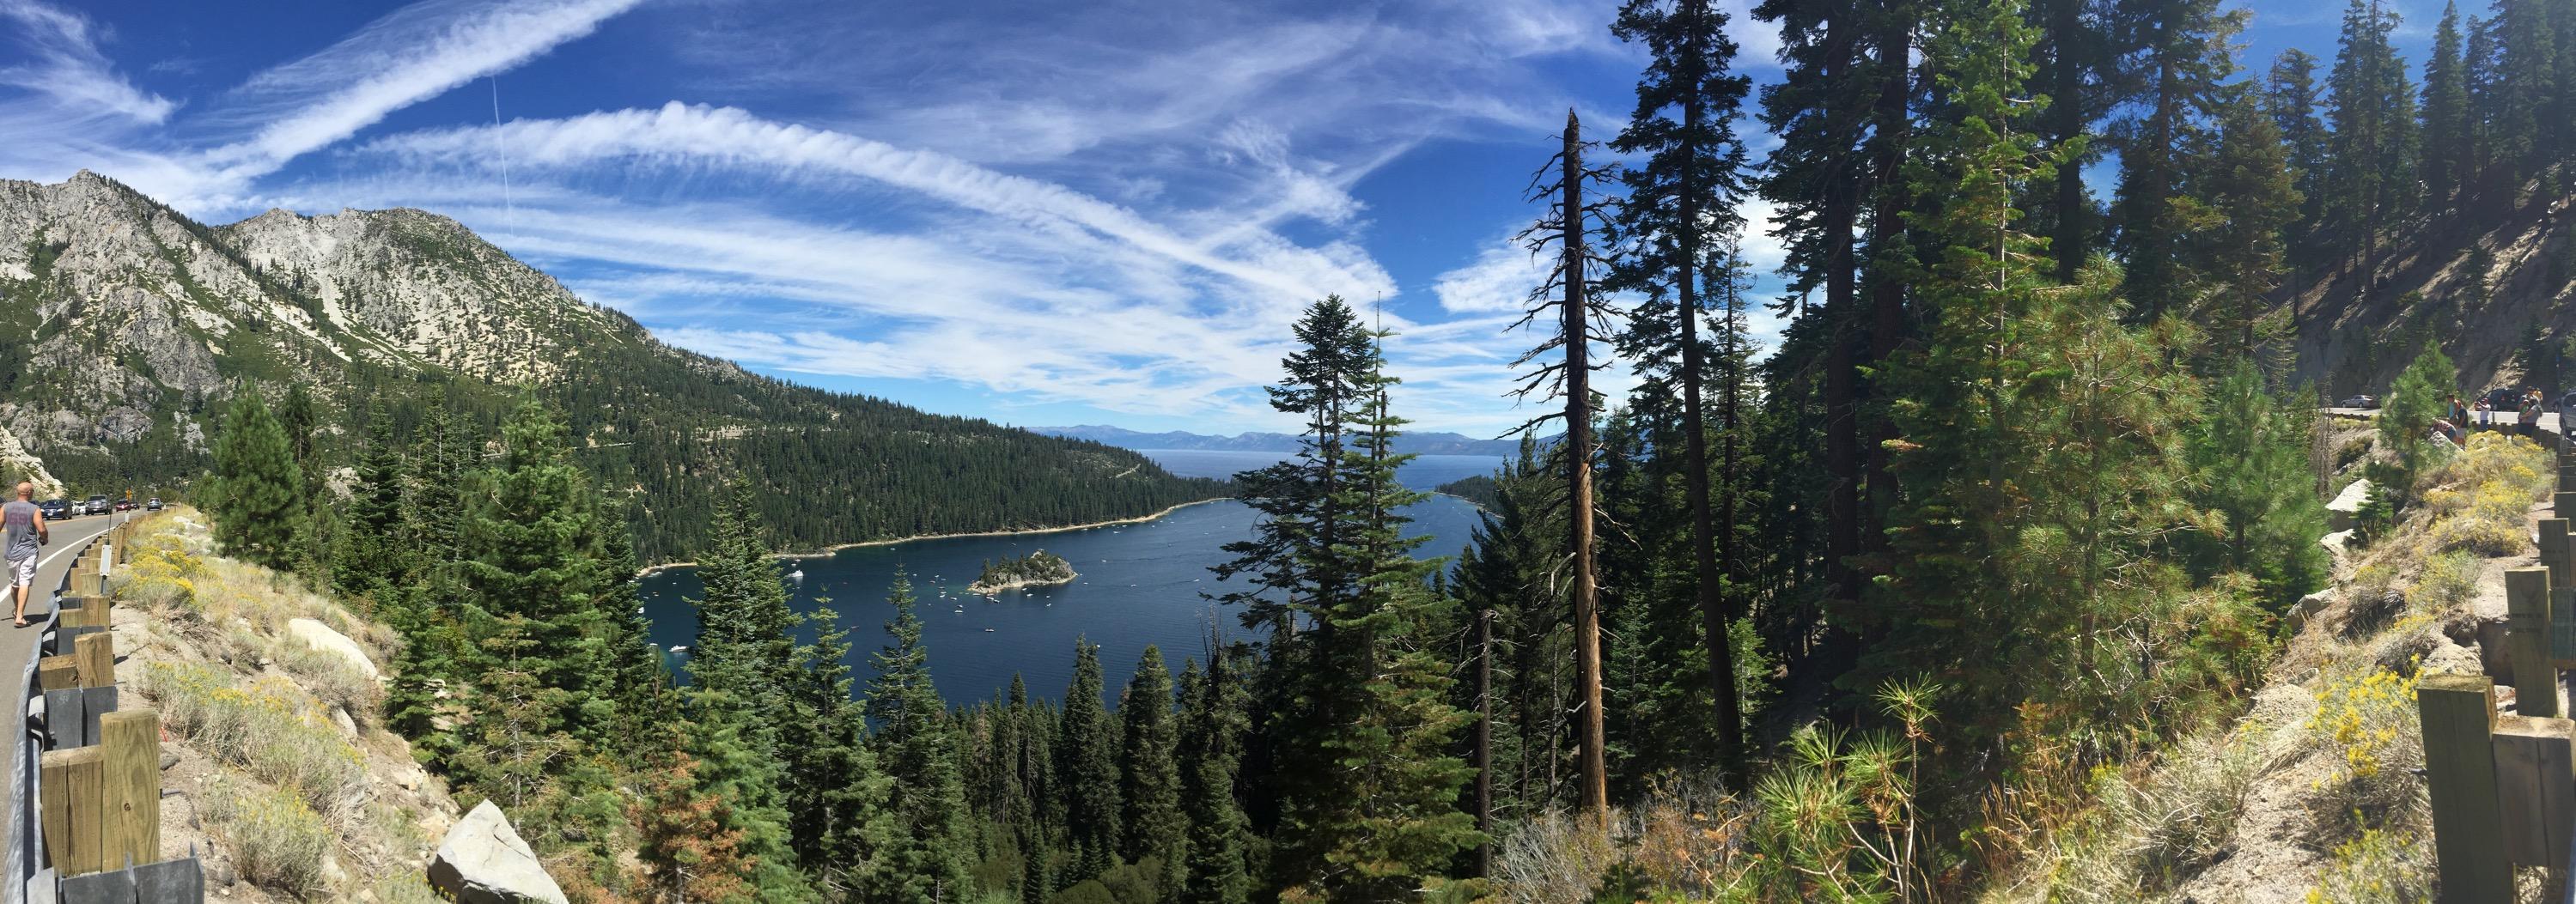 Lake tahoe hotels/casinos casinos in the uk